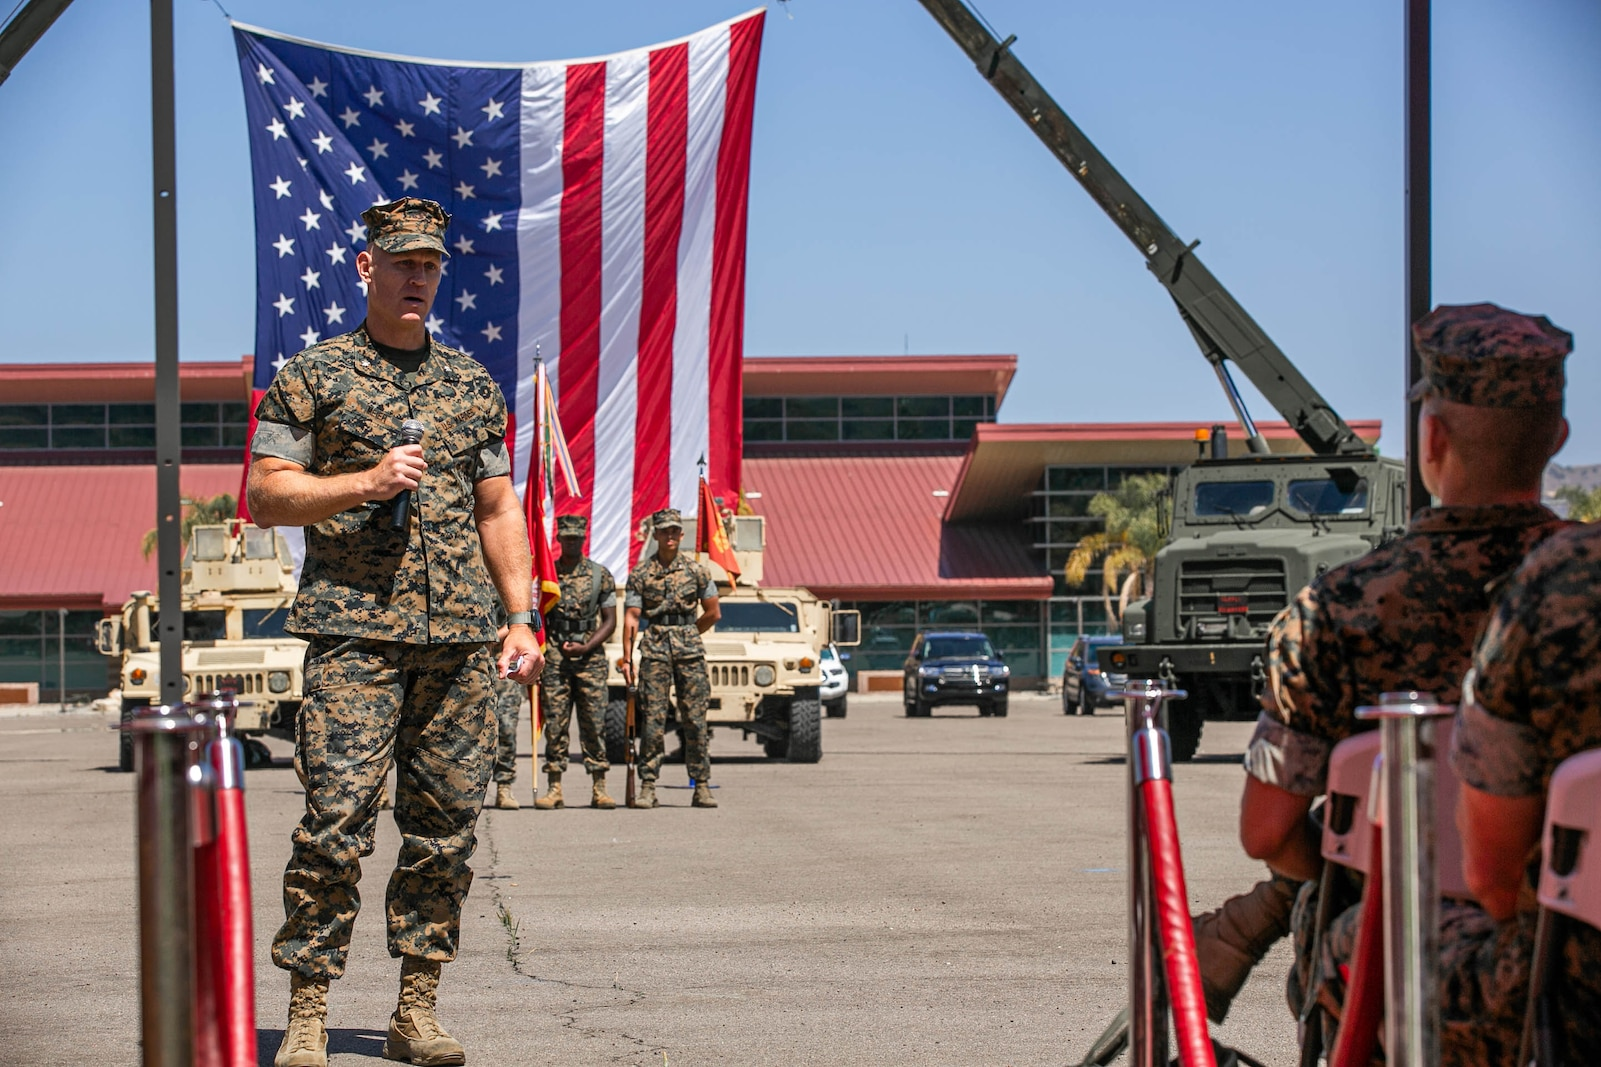 U.S. Marine Corps Lt. Col. Shawn A. Meier, commanding officer, Combat Logistics Battalion 5, gives remarks.